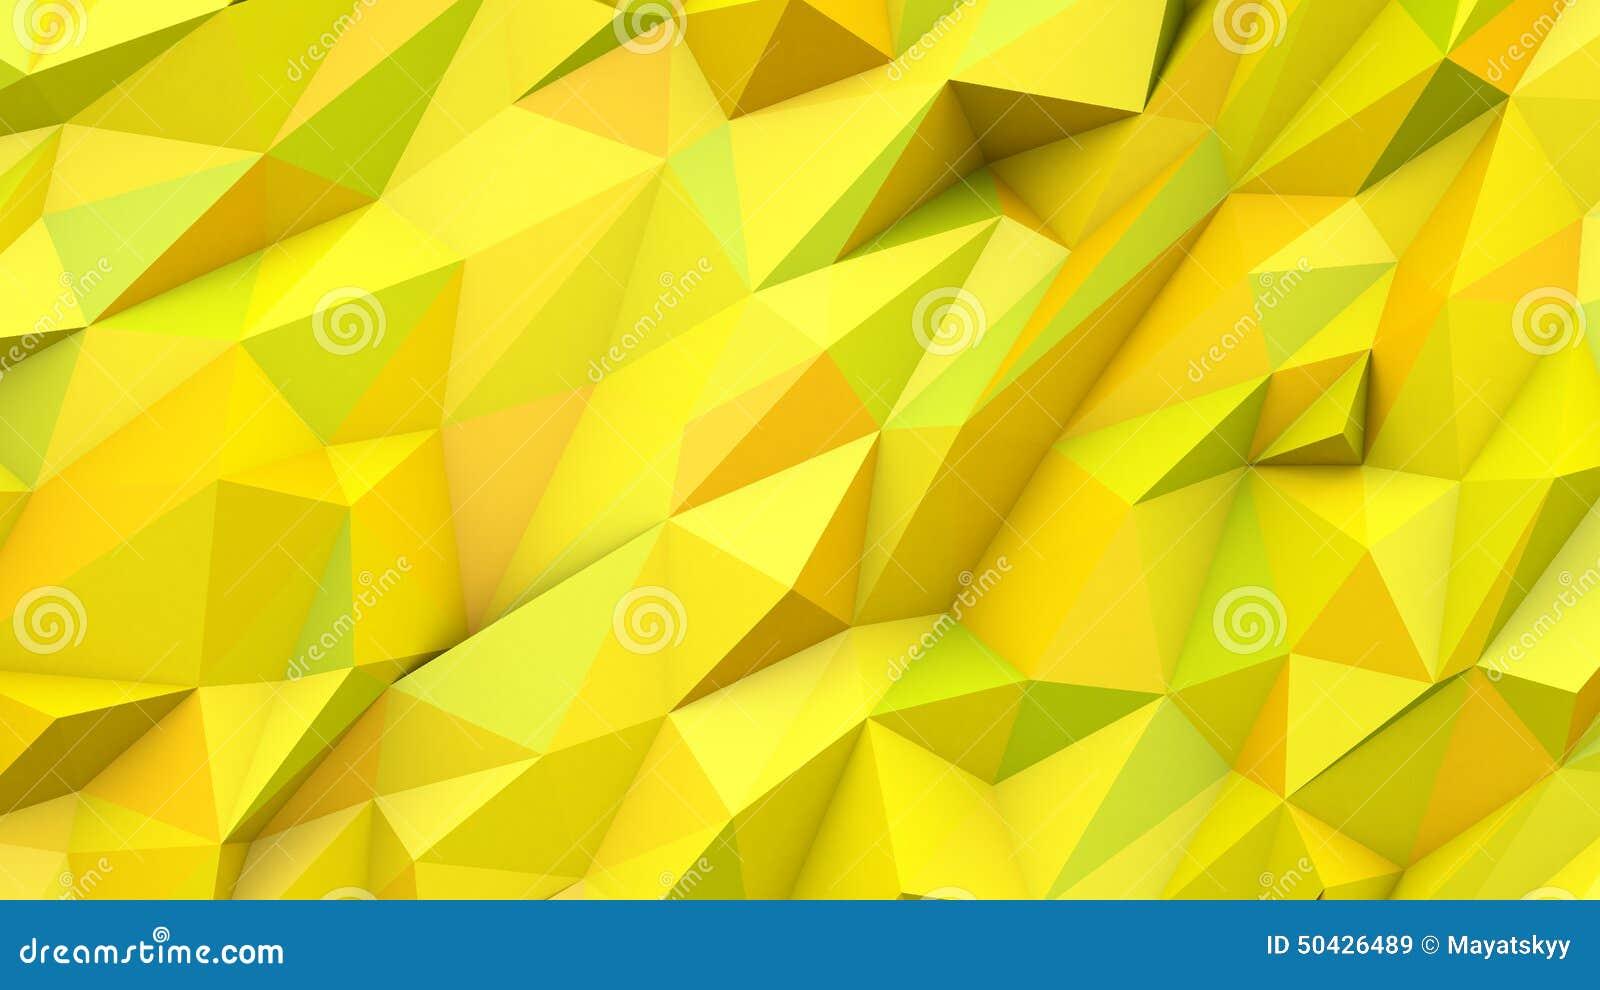 geometric yellow background illustration - photo #39